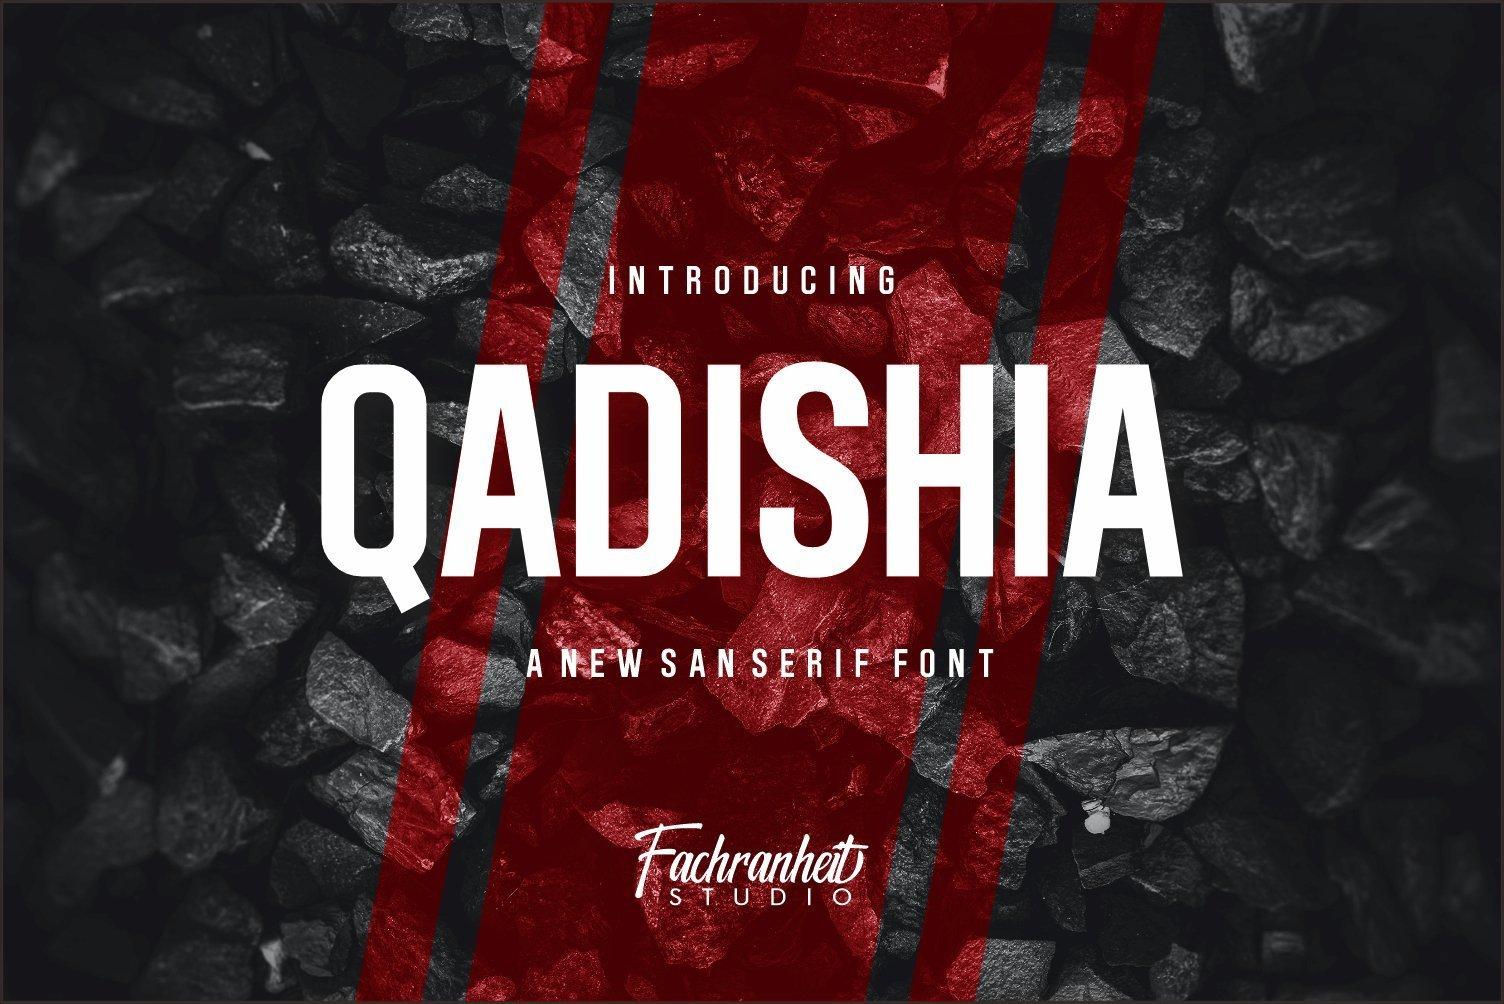 Qadishia-Modern-Sans-Serif-Font-1